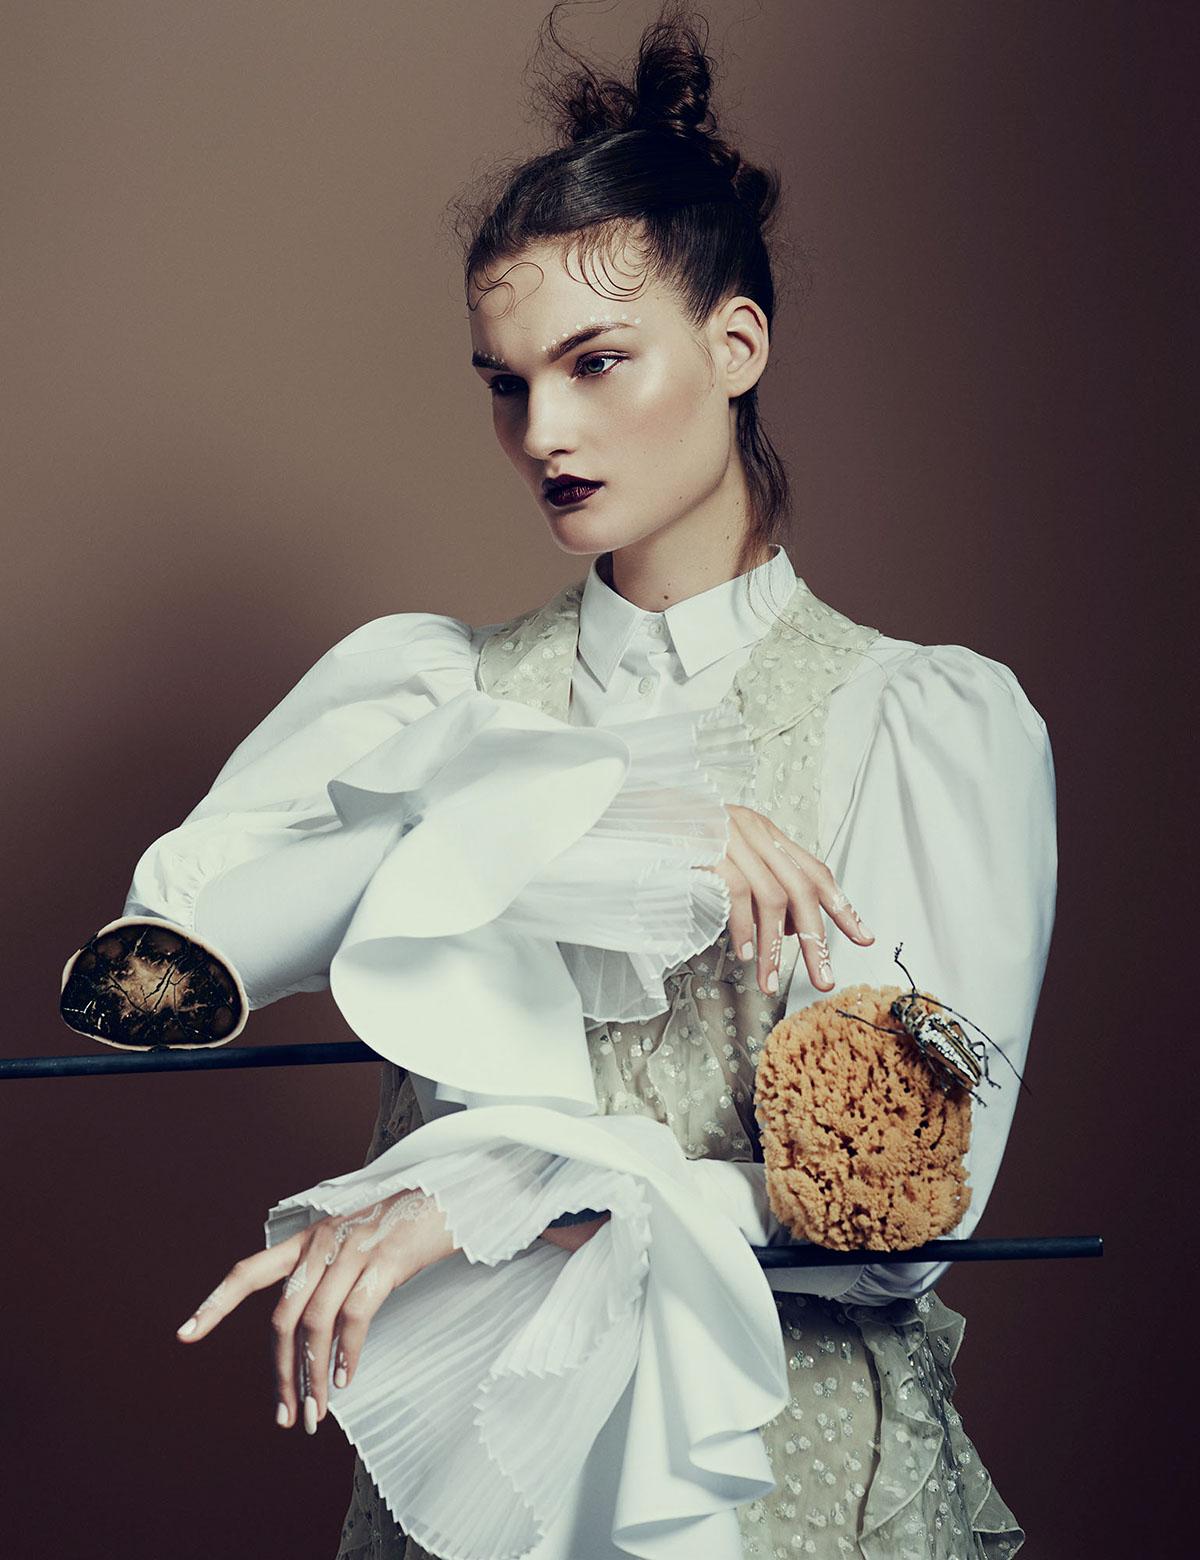 Dior Fashion  set design  still life fashion photography props beauty Magic